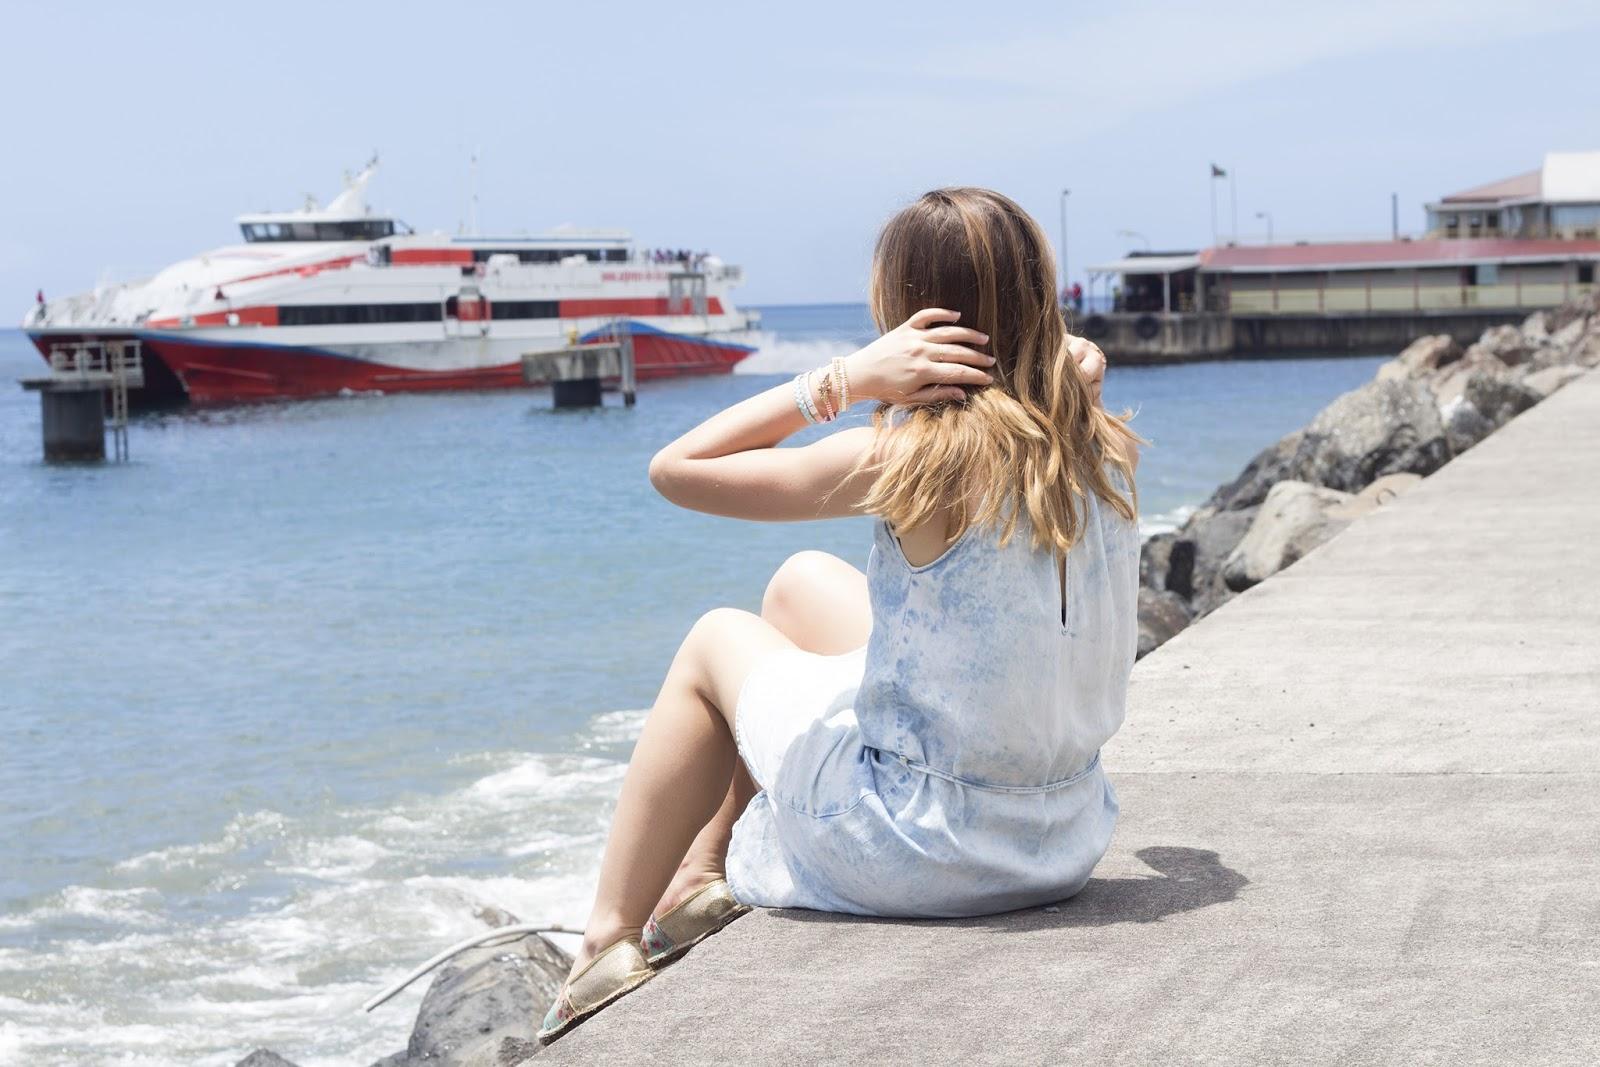 Express des îles ferry